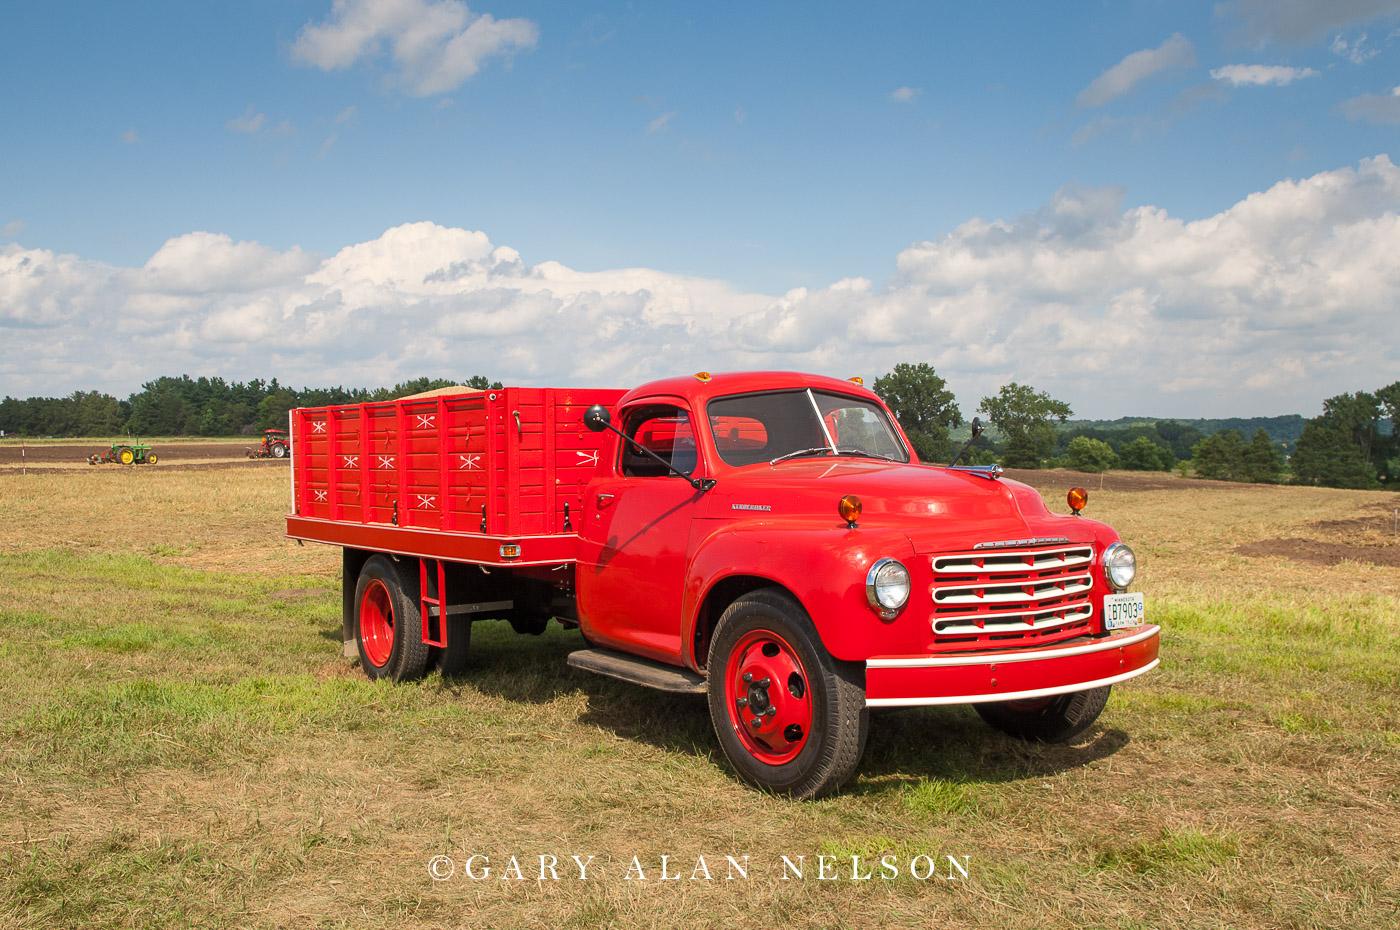 VT-11-91-ST 1949 Studebaker R 16 A Grain Truck